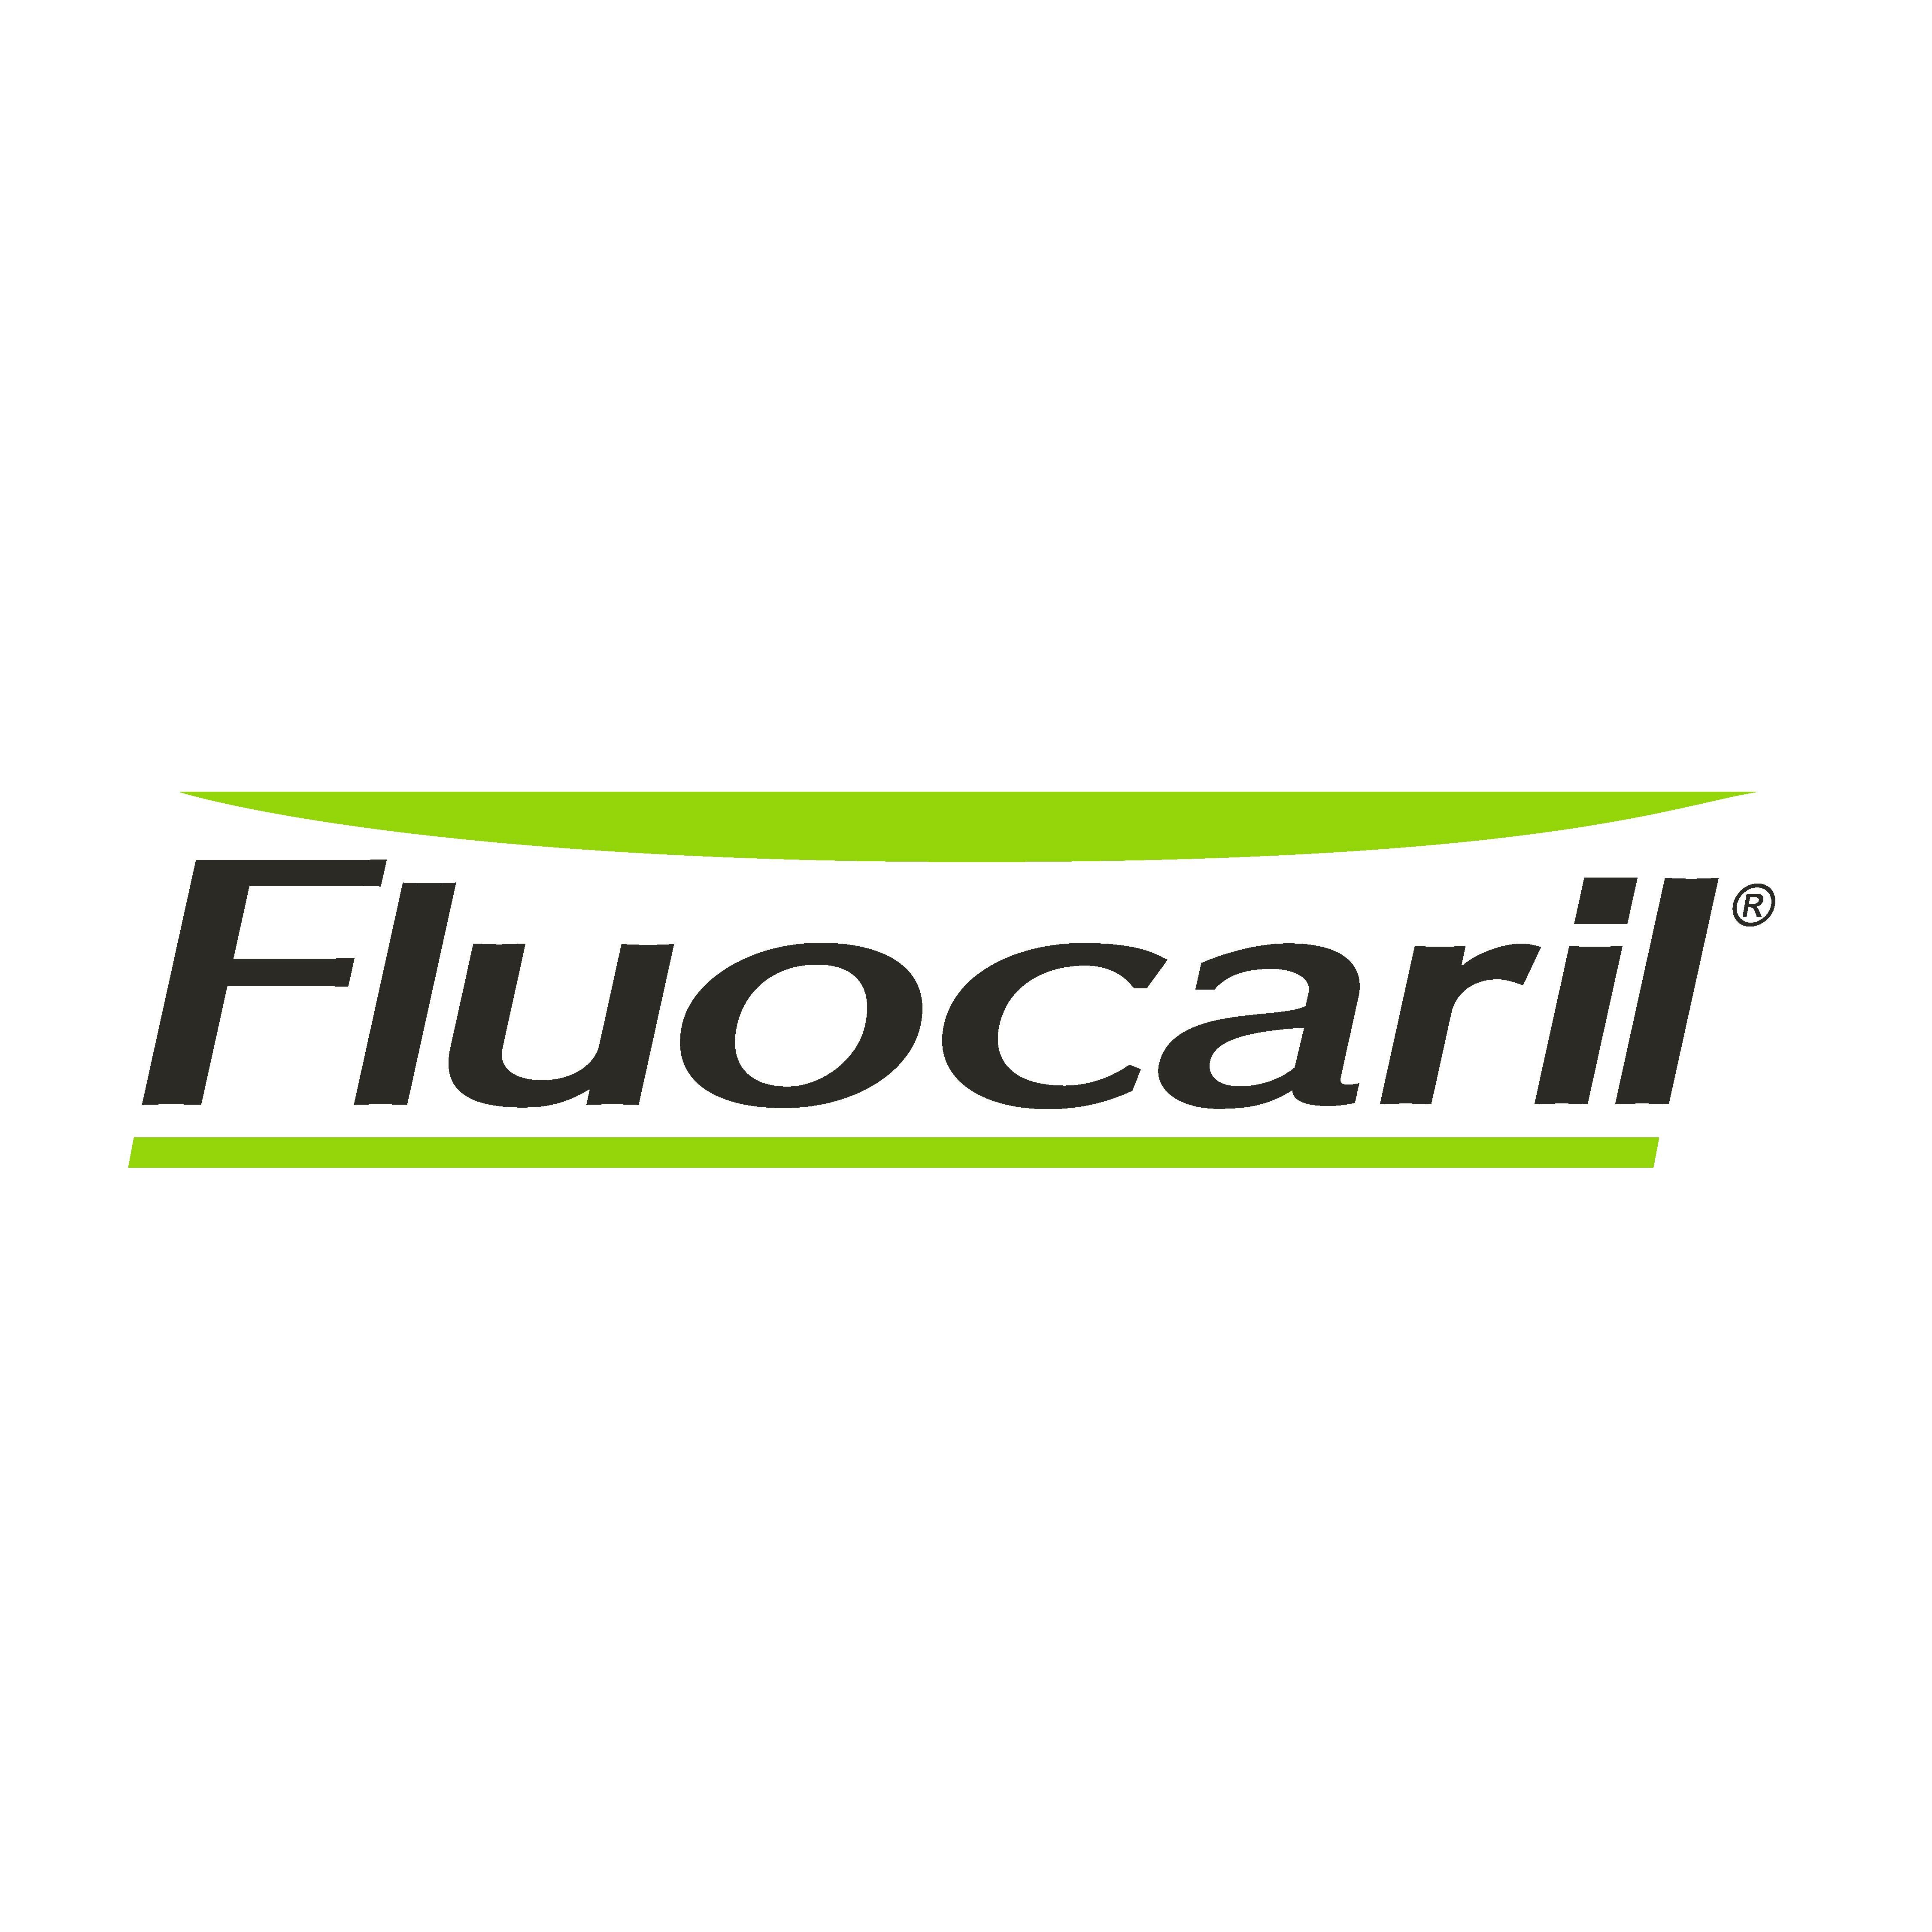 Fluocaril Thailand logo